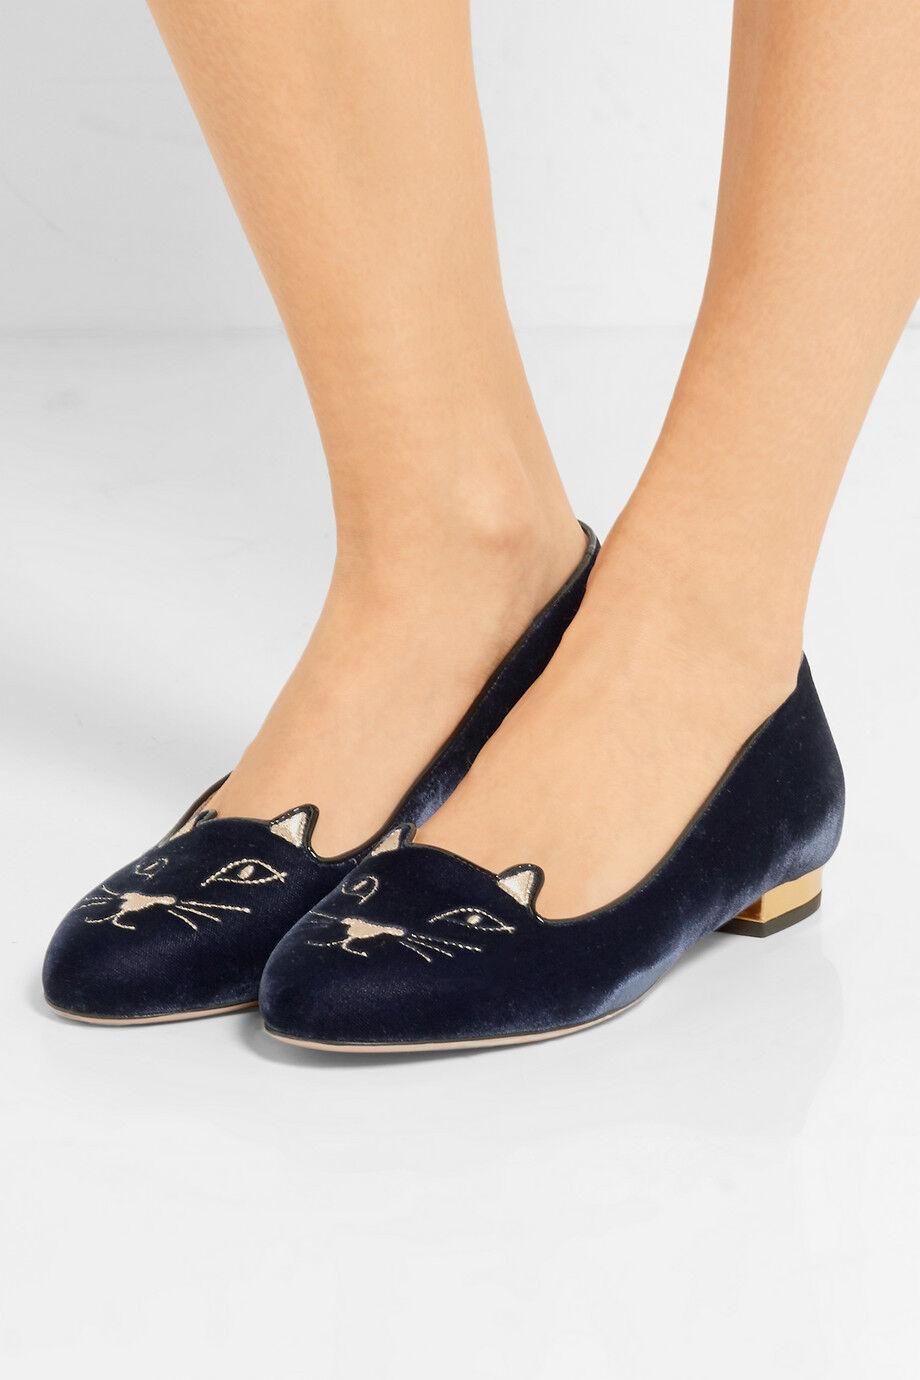 CHARLOTTE OLYMPIA Kitty EmbroideROT Velvet Slippers Flat Navy Schuhe 5.5 Navy Flat Blau 35.5 76ee5a